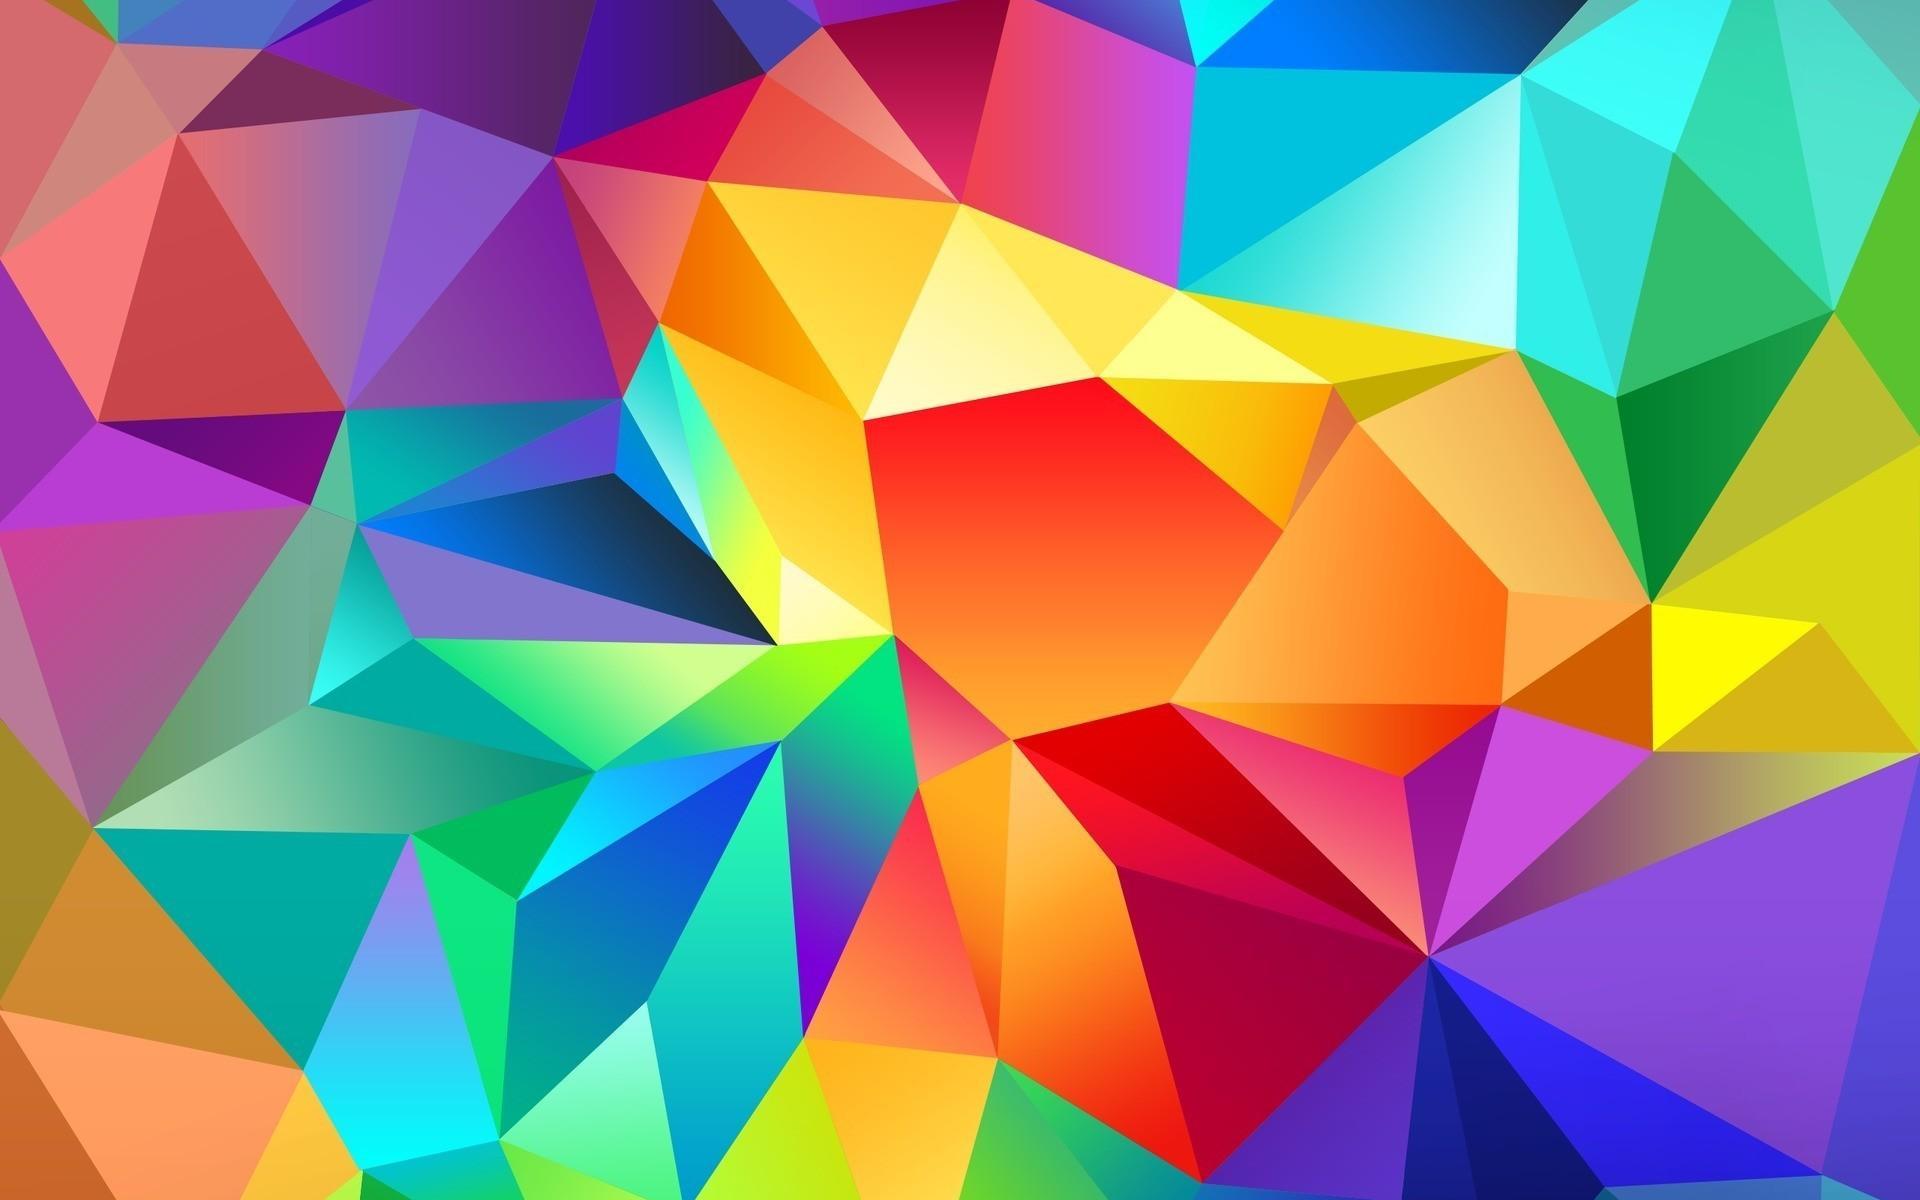 Segitiga Berwarna Warni Polygon Background 731097 Hd Wallpaper Backgrounds Download